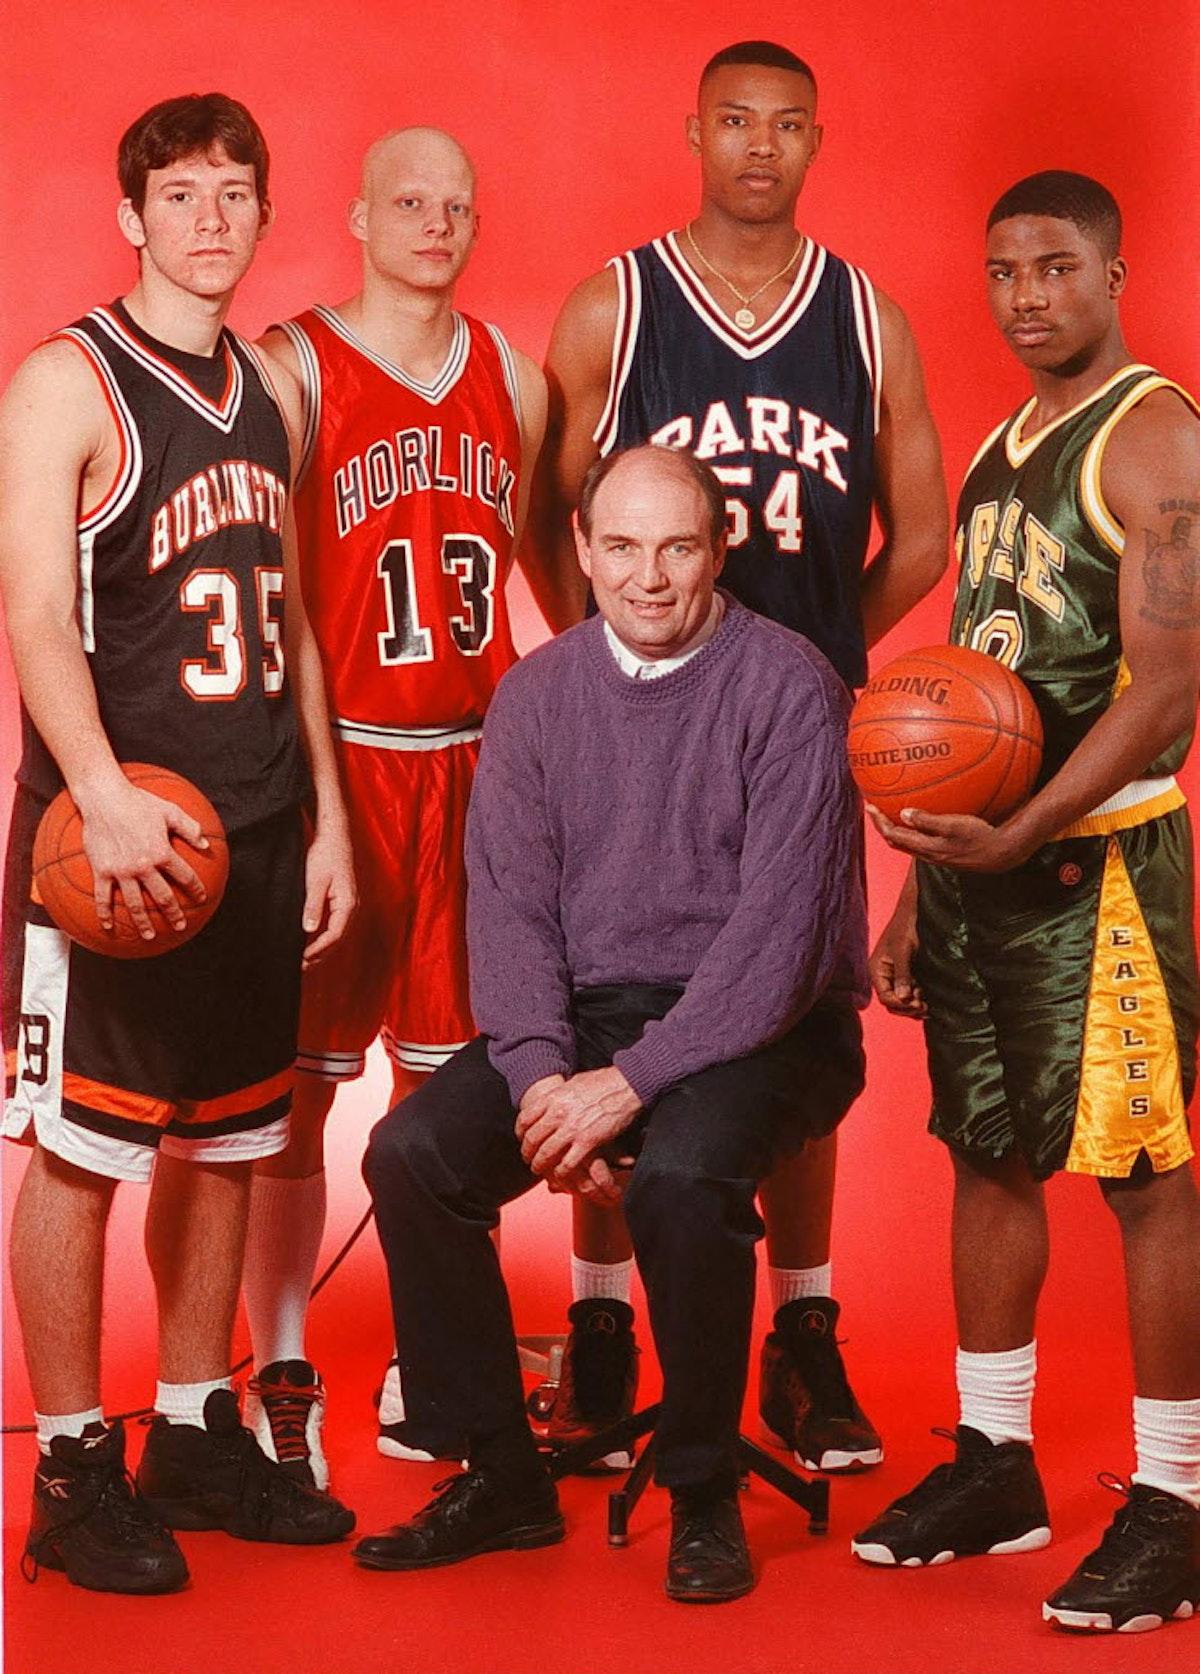 Dallas Mavericks: Flashback: Tony Romo and Caron Butler once shared rivalry on the basketball ...